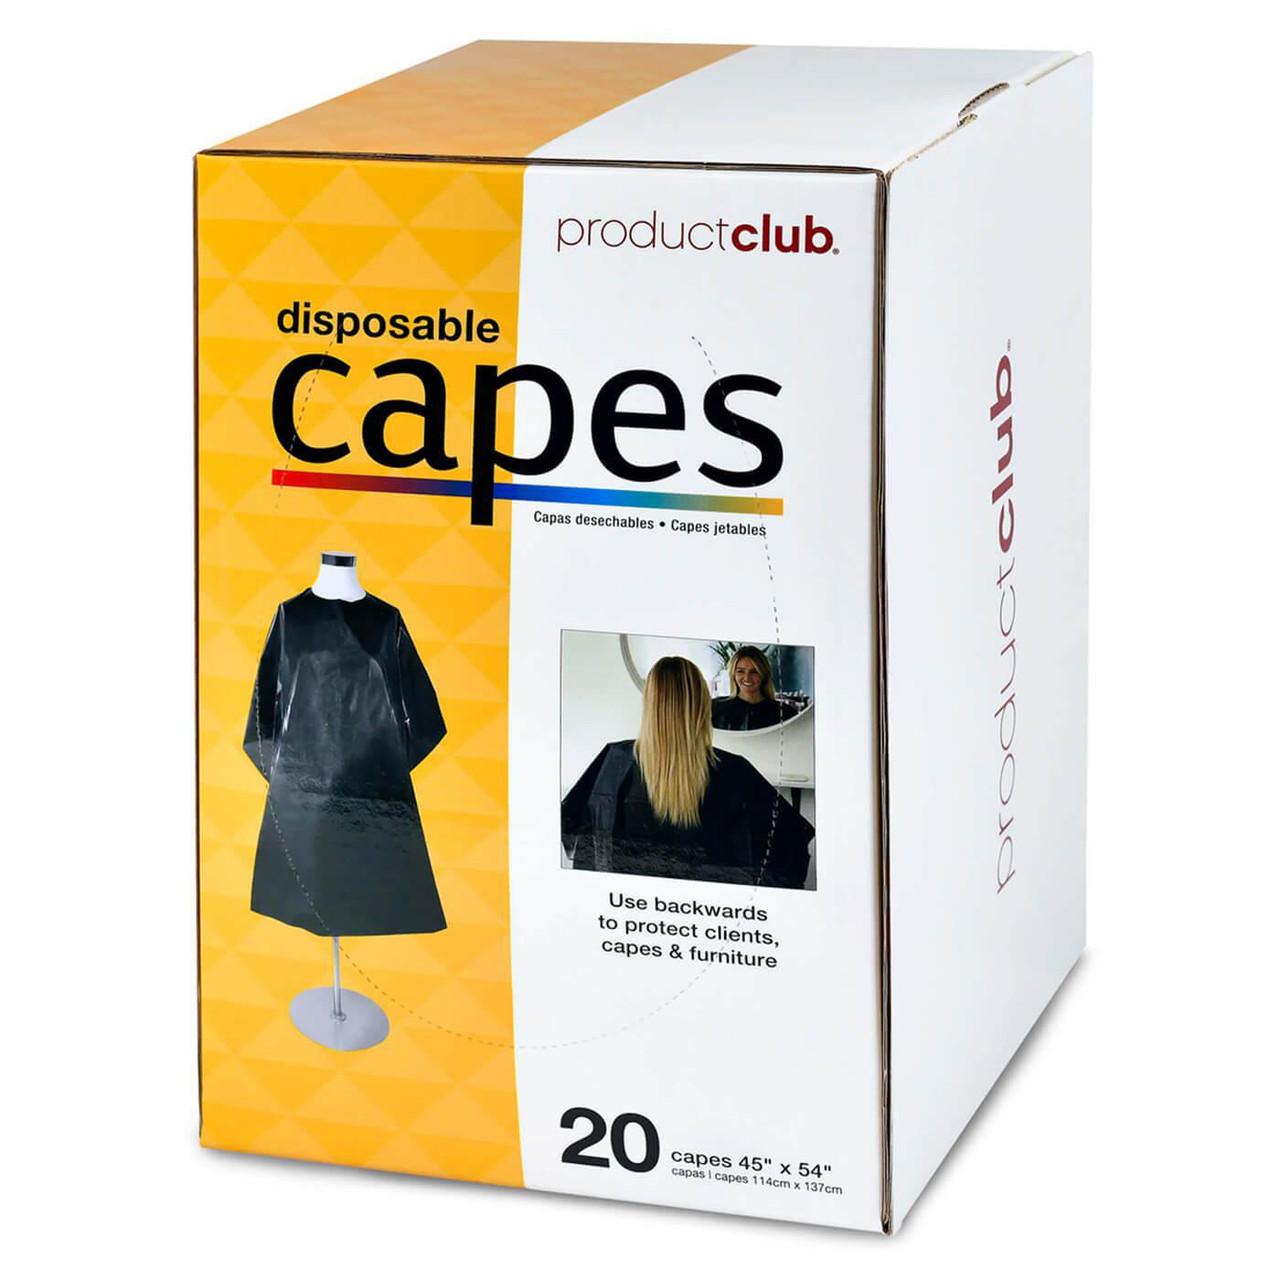 Disposable Capes - Black Plastic - 20 Pack